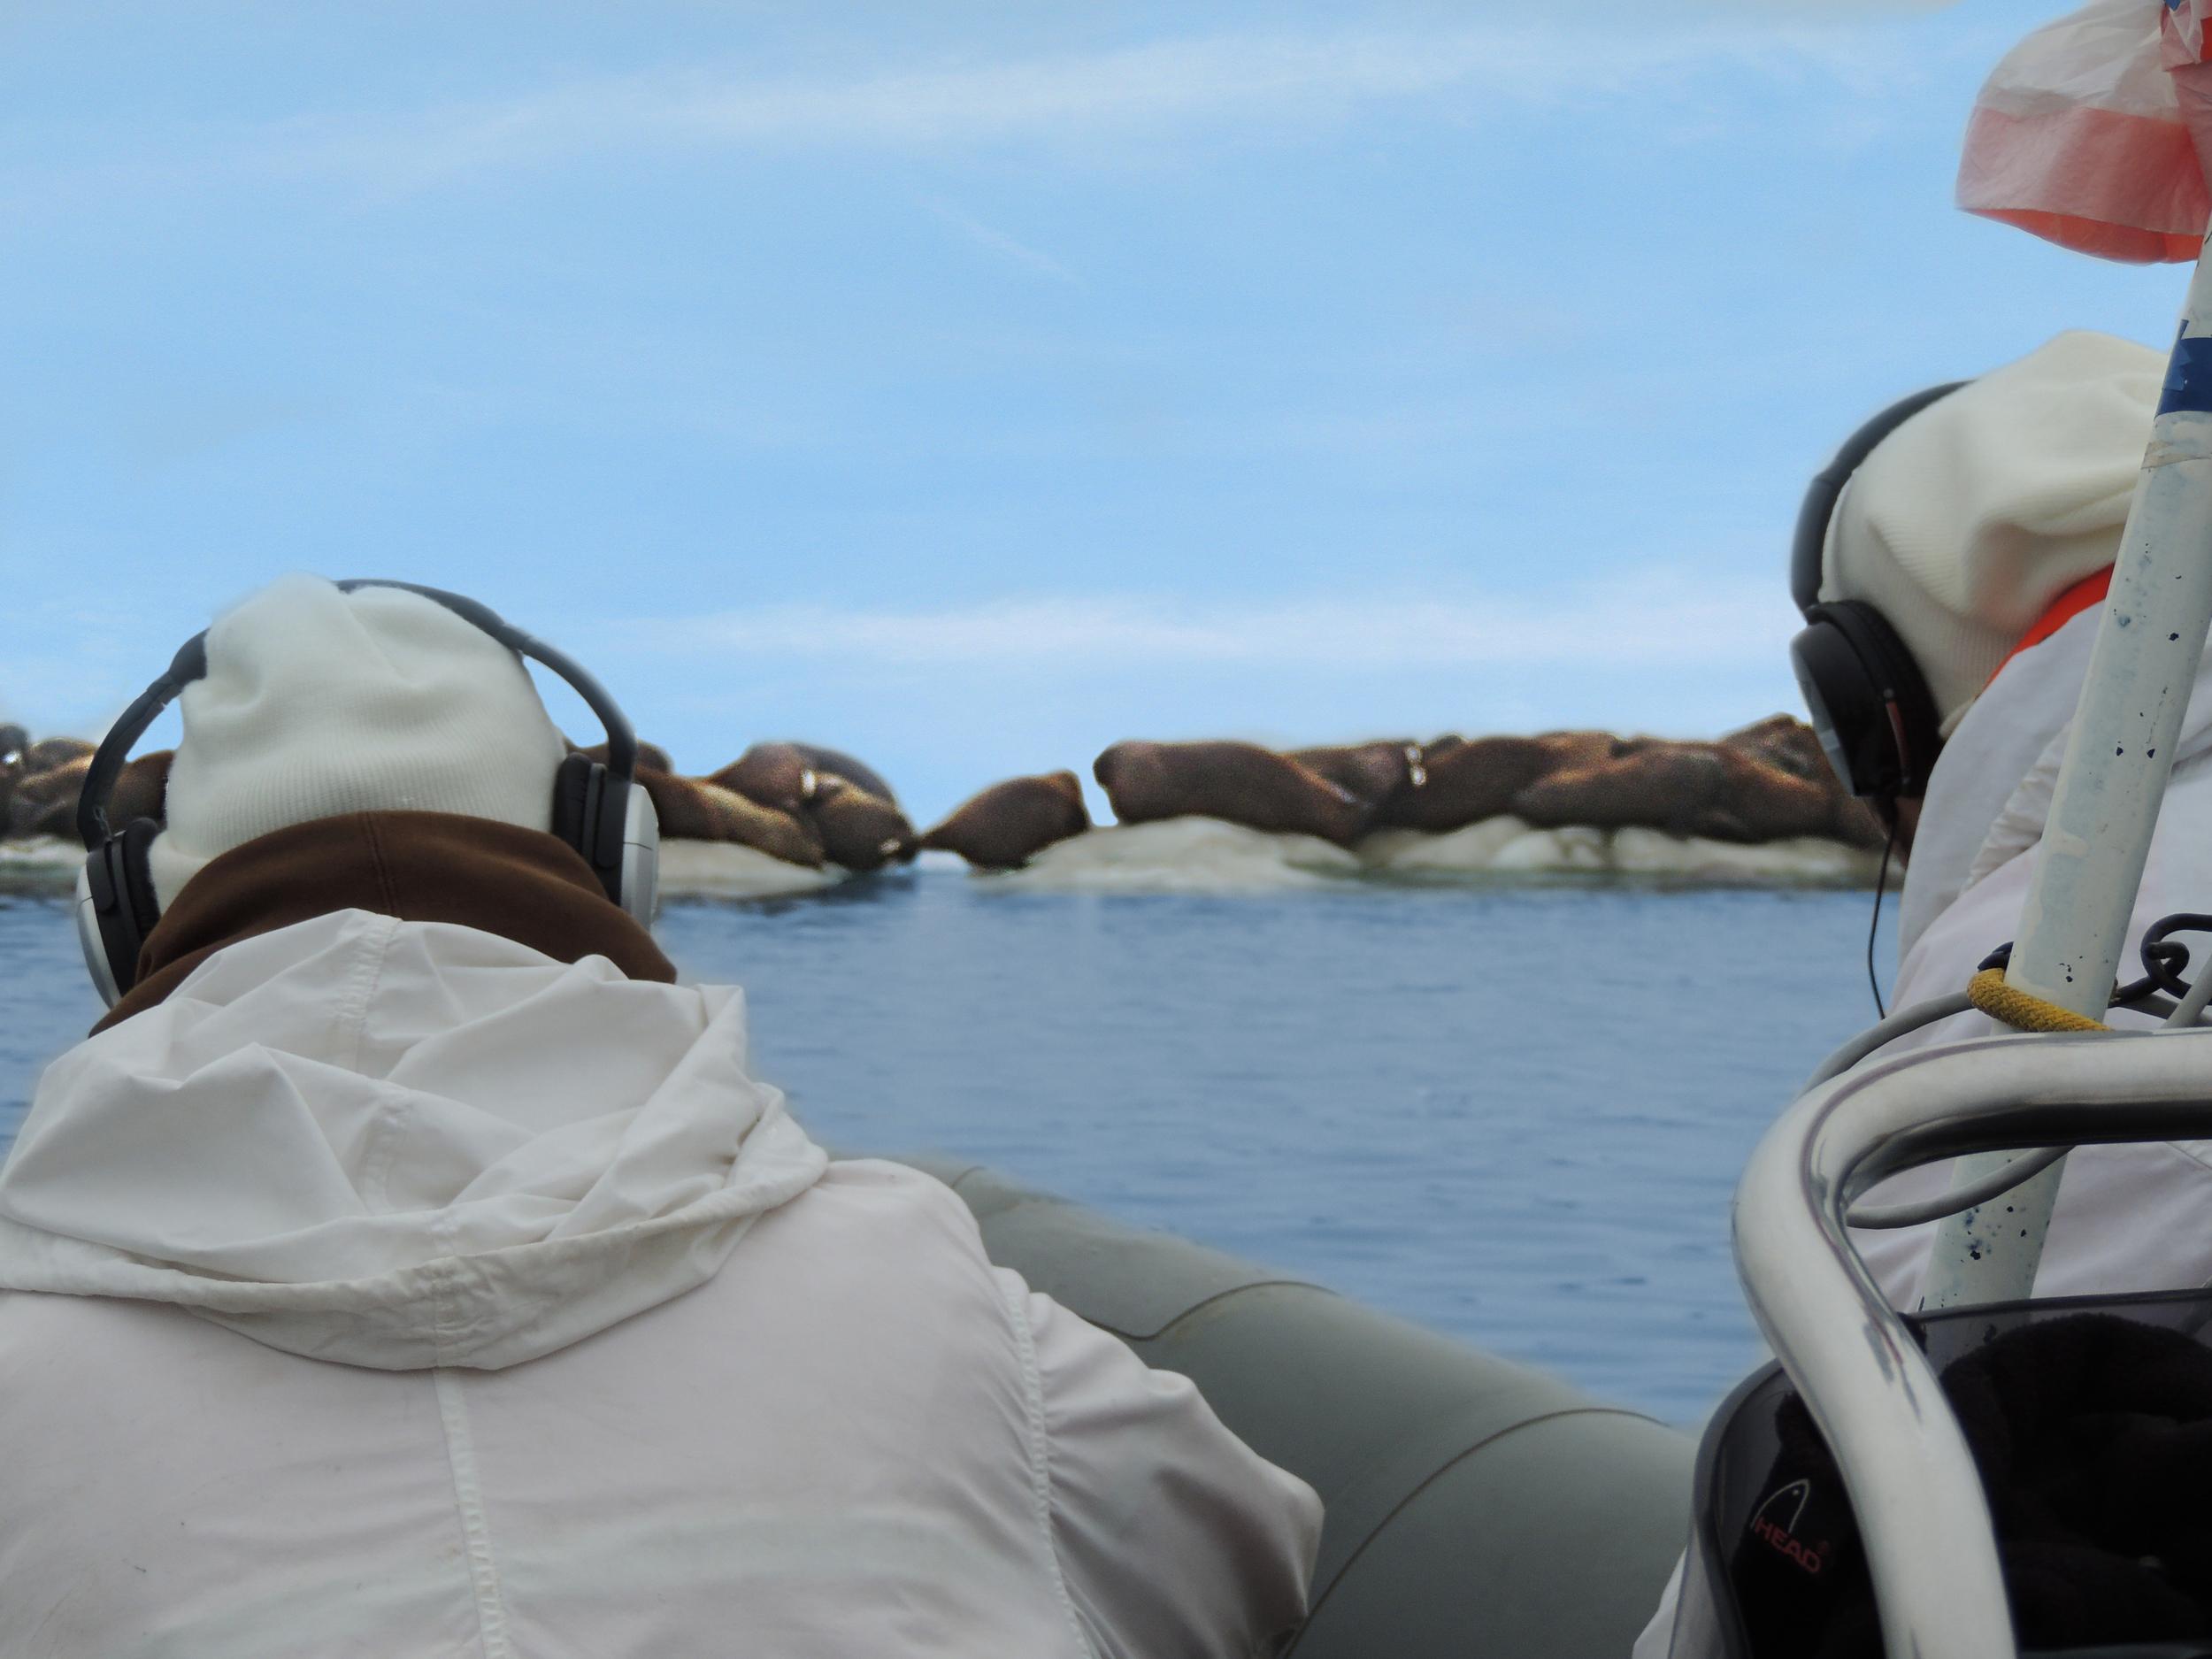 Passive acoustic monitoring of Pacific walrus (Odobenus rosmarus divergens) in the Chukchi Sea, Alaska